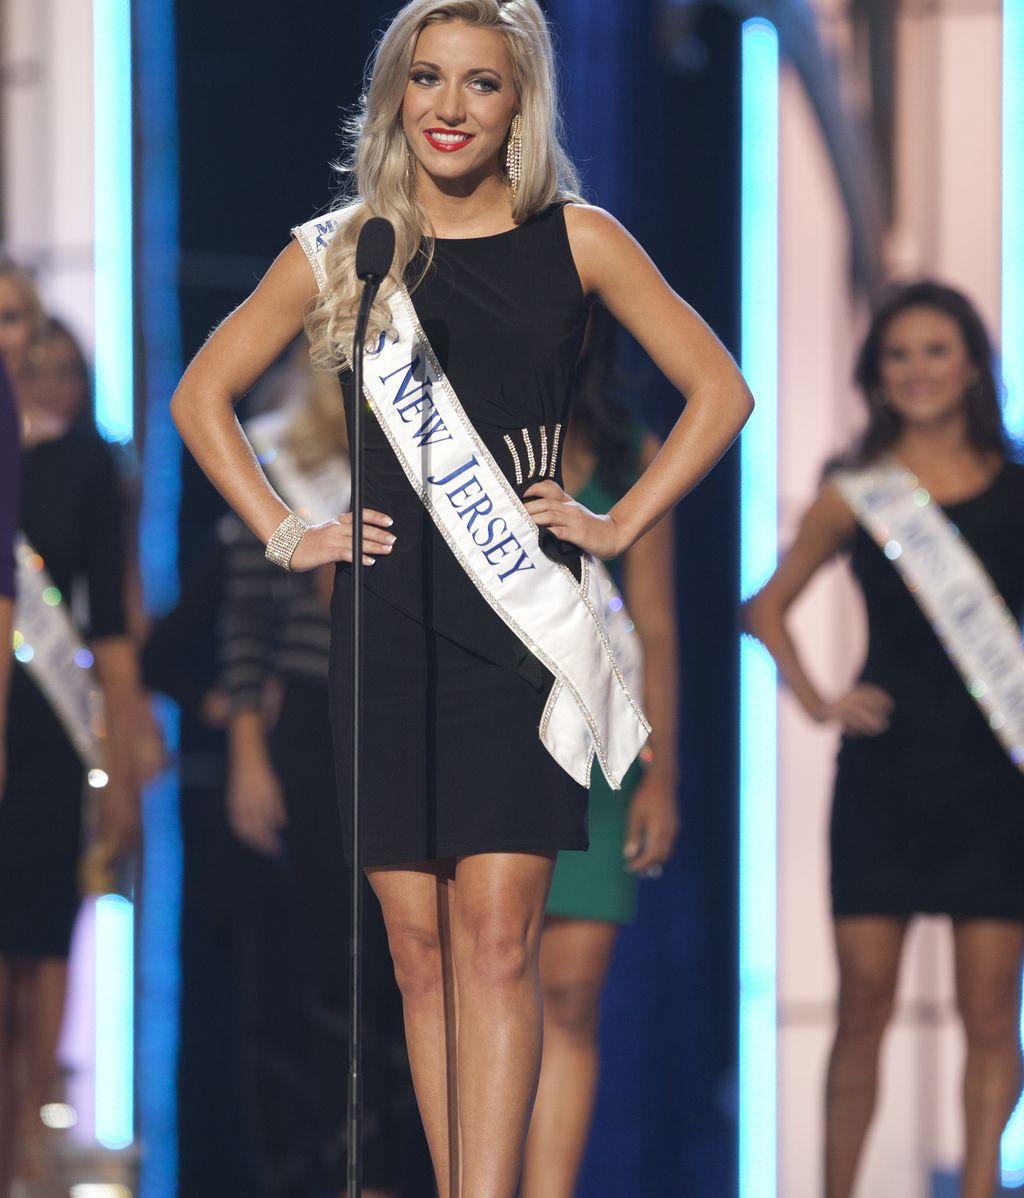 Cara McCollum, Miss America 2014